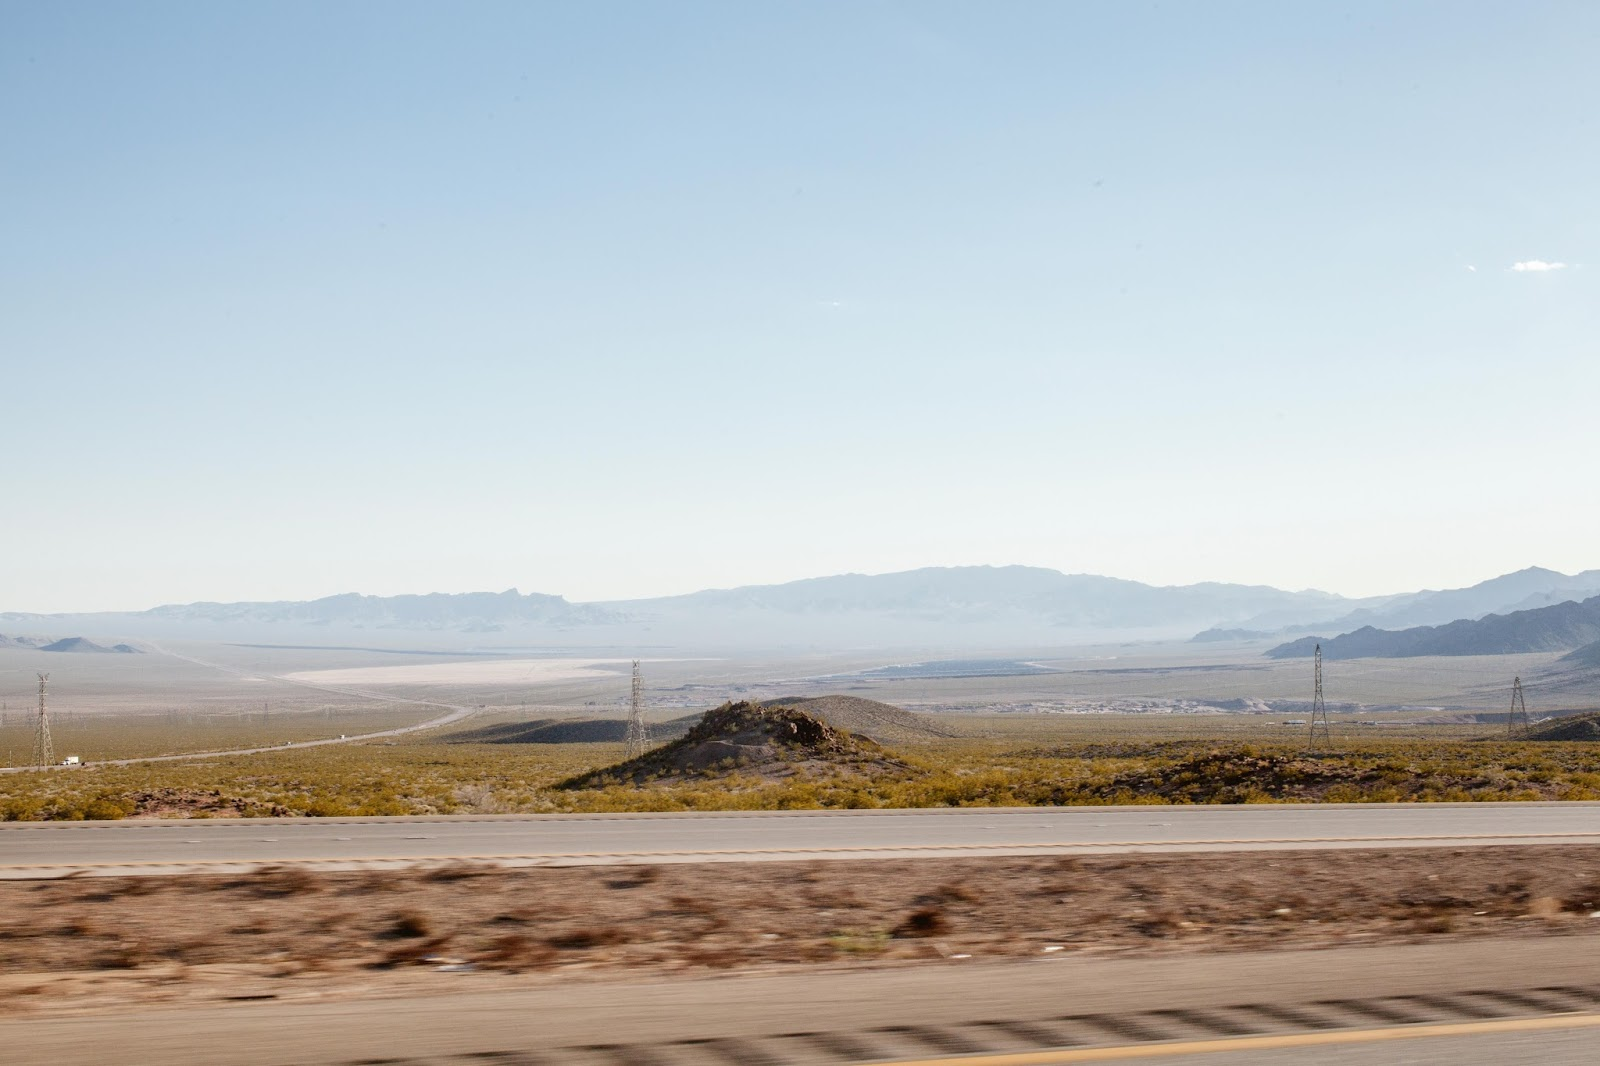 Las Vegas country side